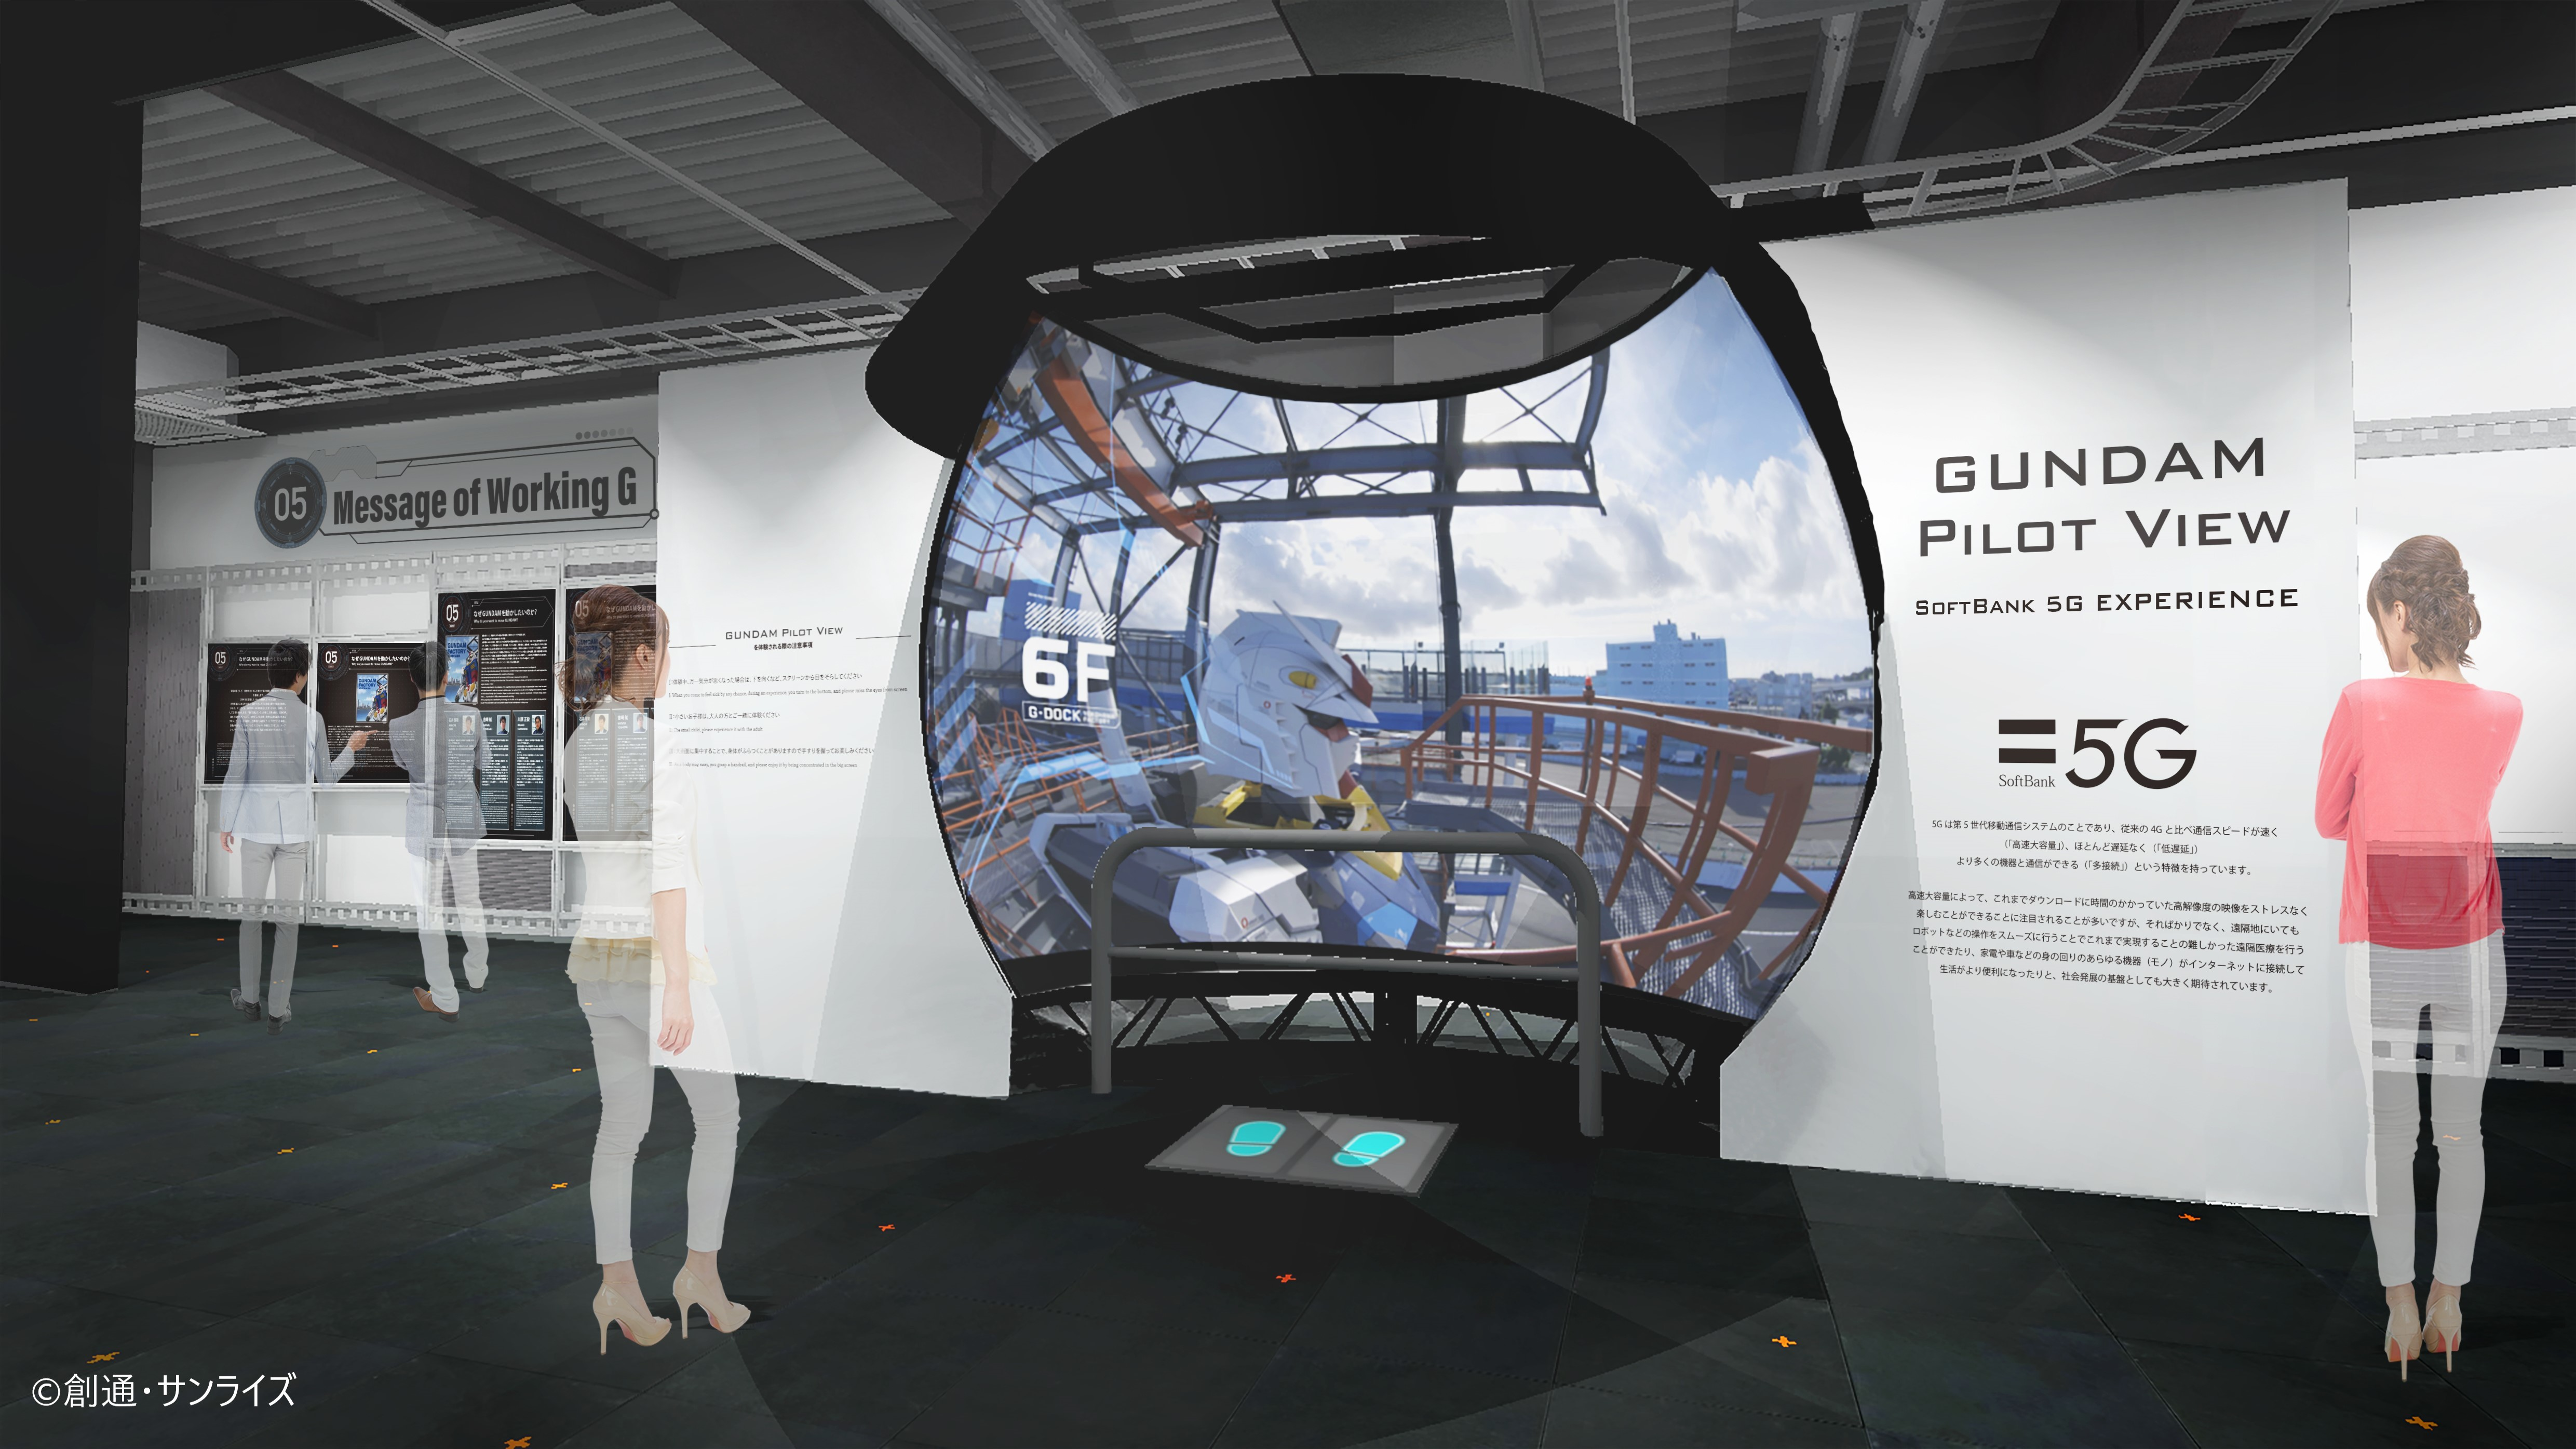 「GUNDAM Pilot View SoftBank 5G EXPERIENCE」では 5G 通信を活用してガンダムとリアルタイムに視界を共有。まるでコクピットに乗り込んだかのような体験ができる